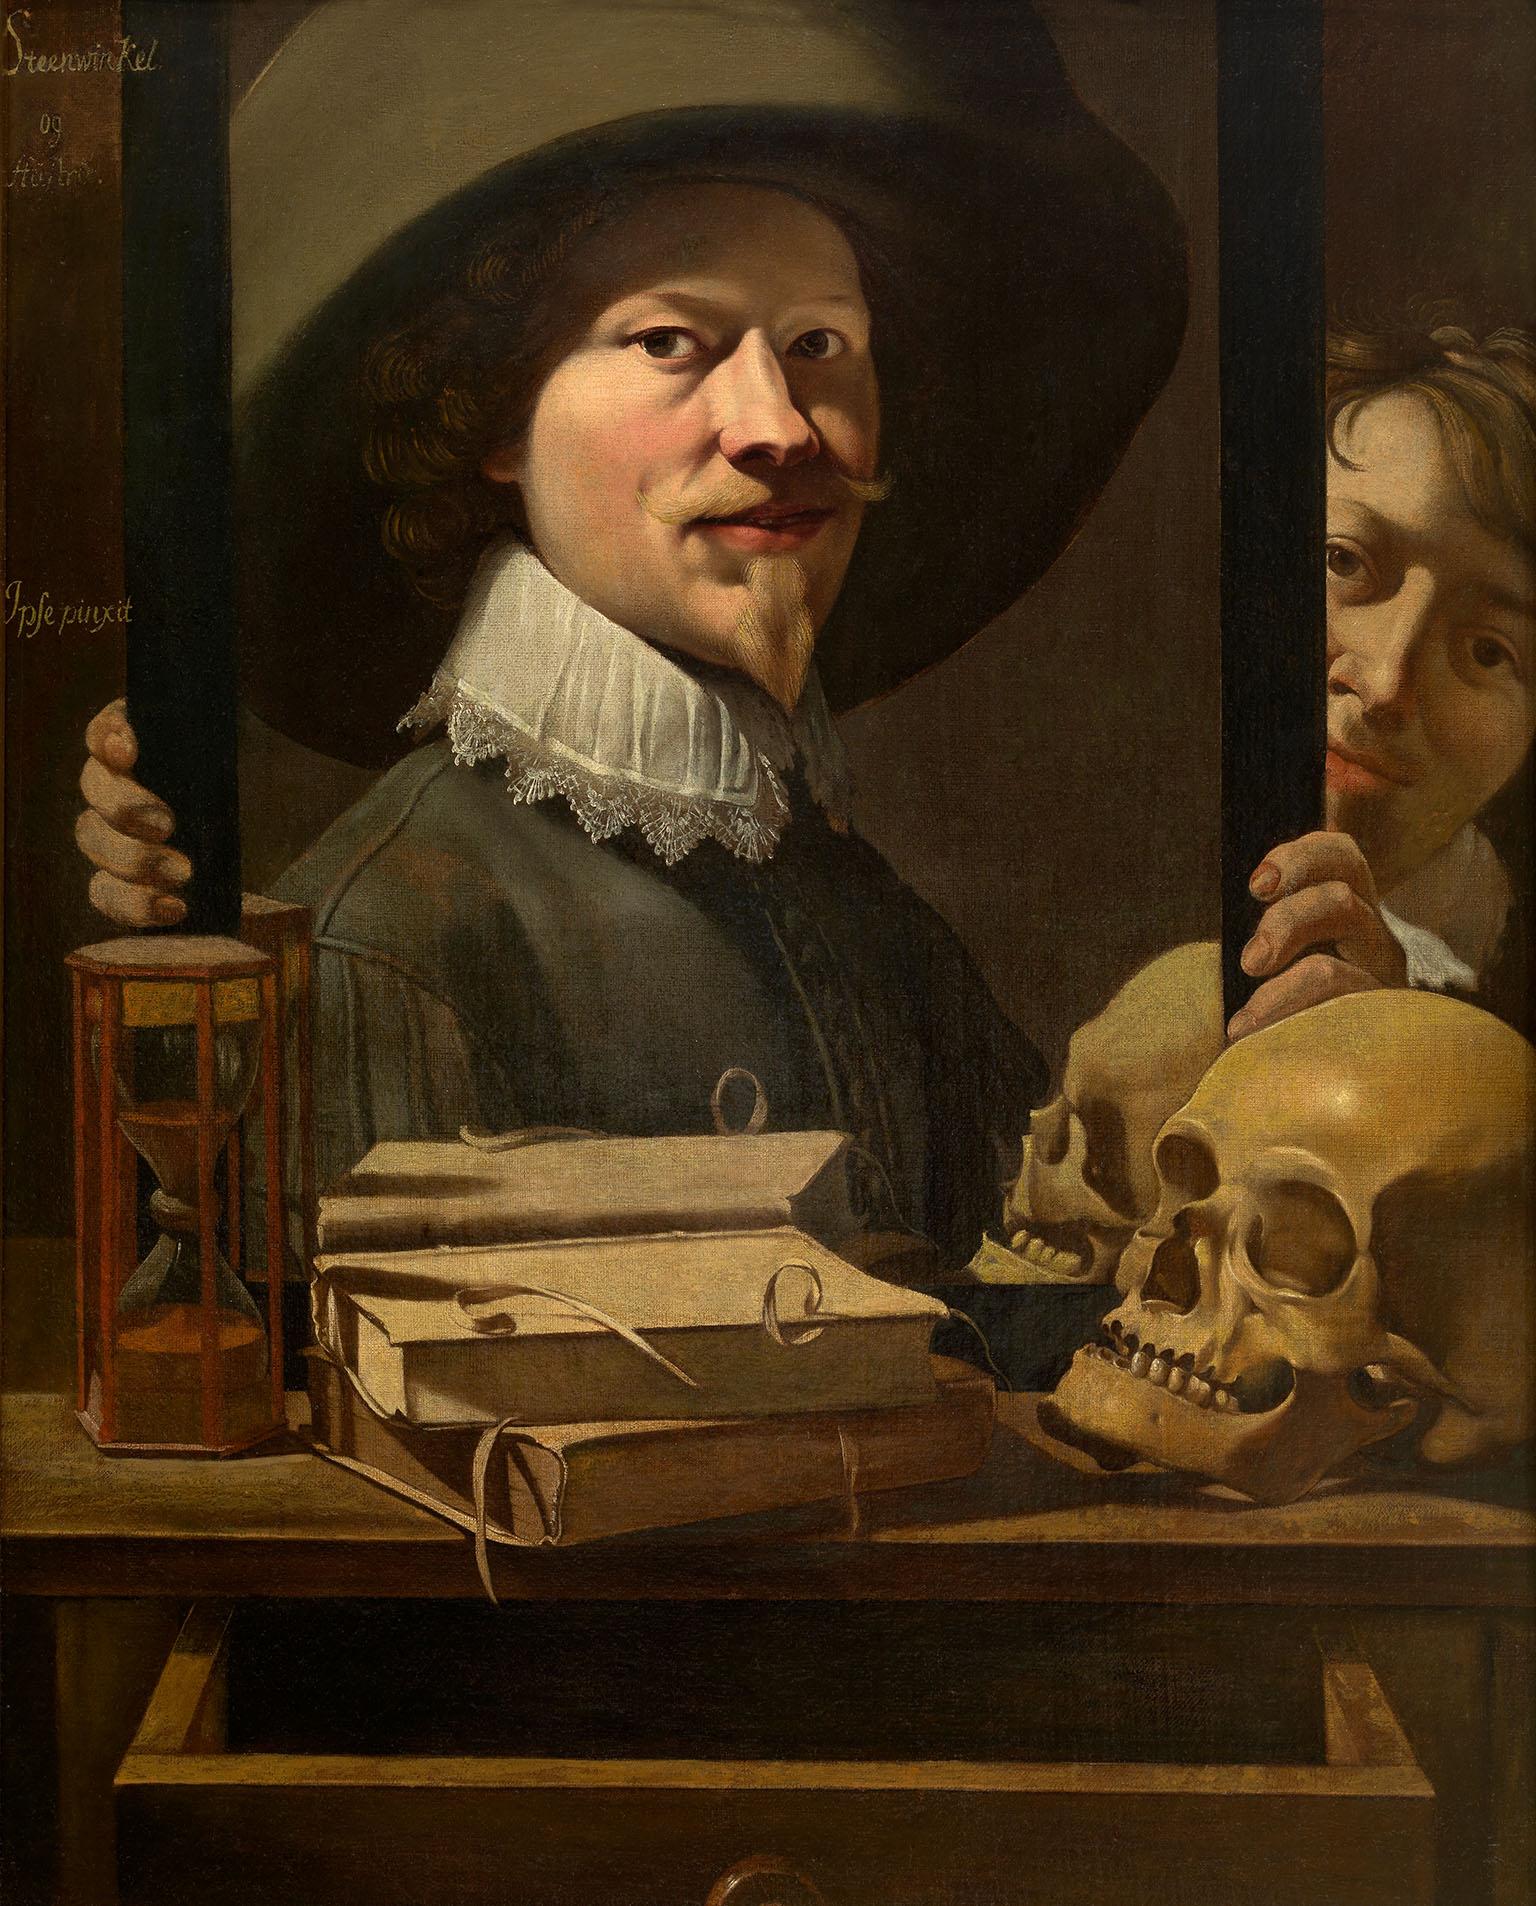 Antoine Steenwinkel - Vanitas, portrait de l artiste, XVIIeme s. Royal Museum of Fine Arts Antwerp